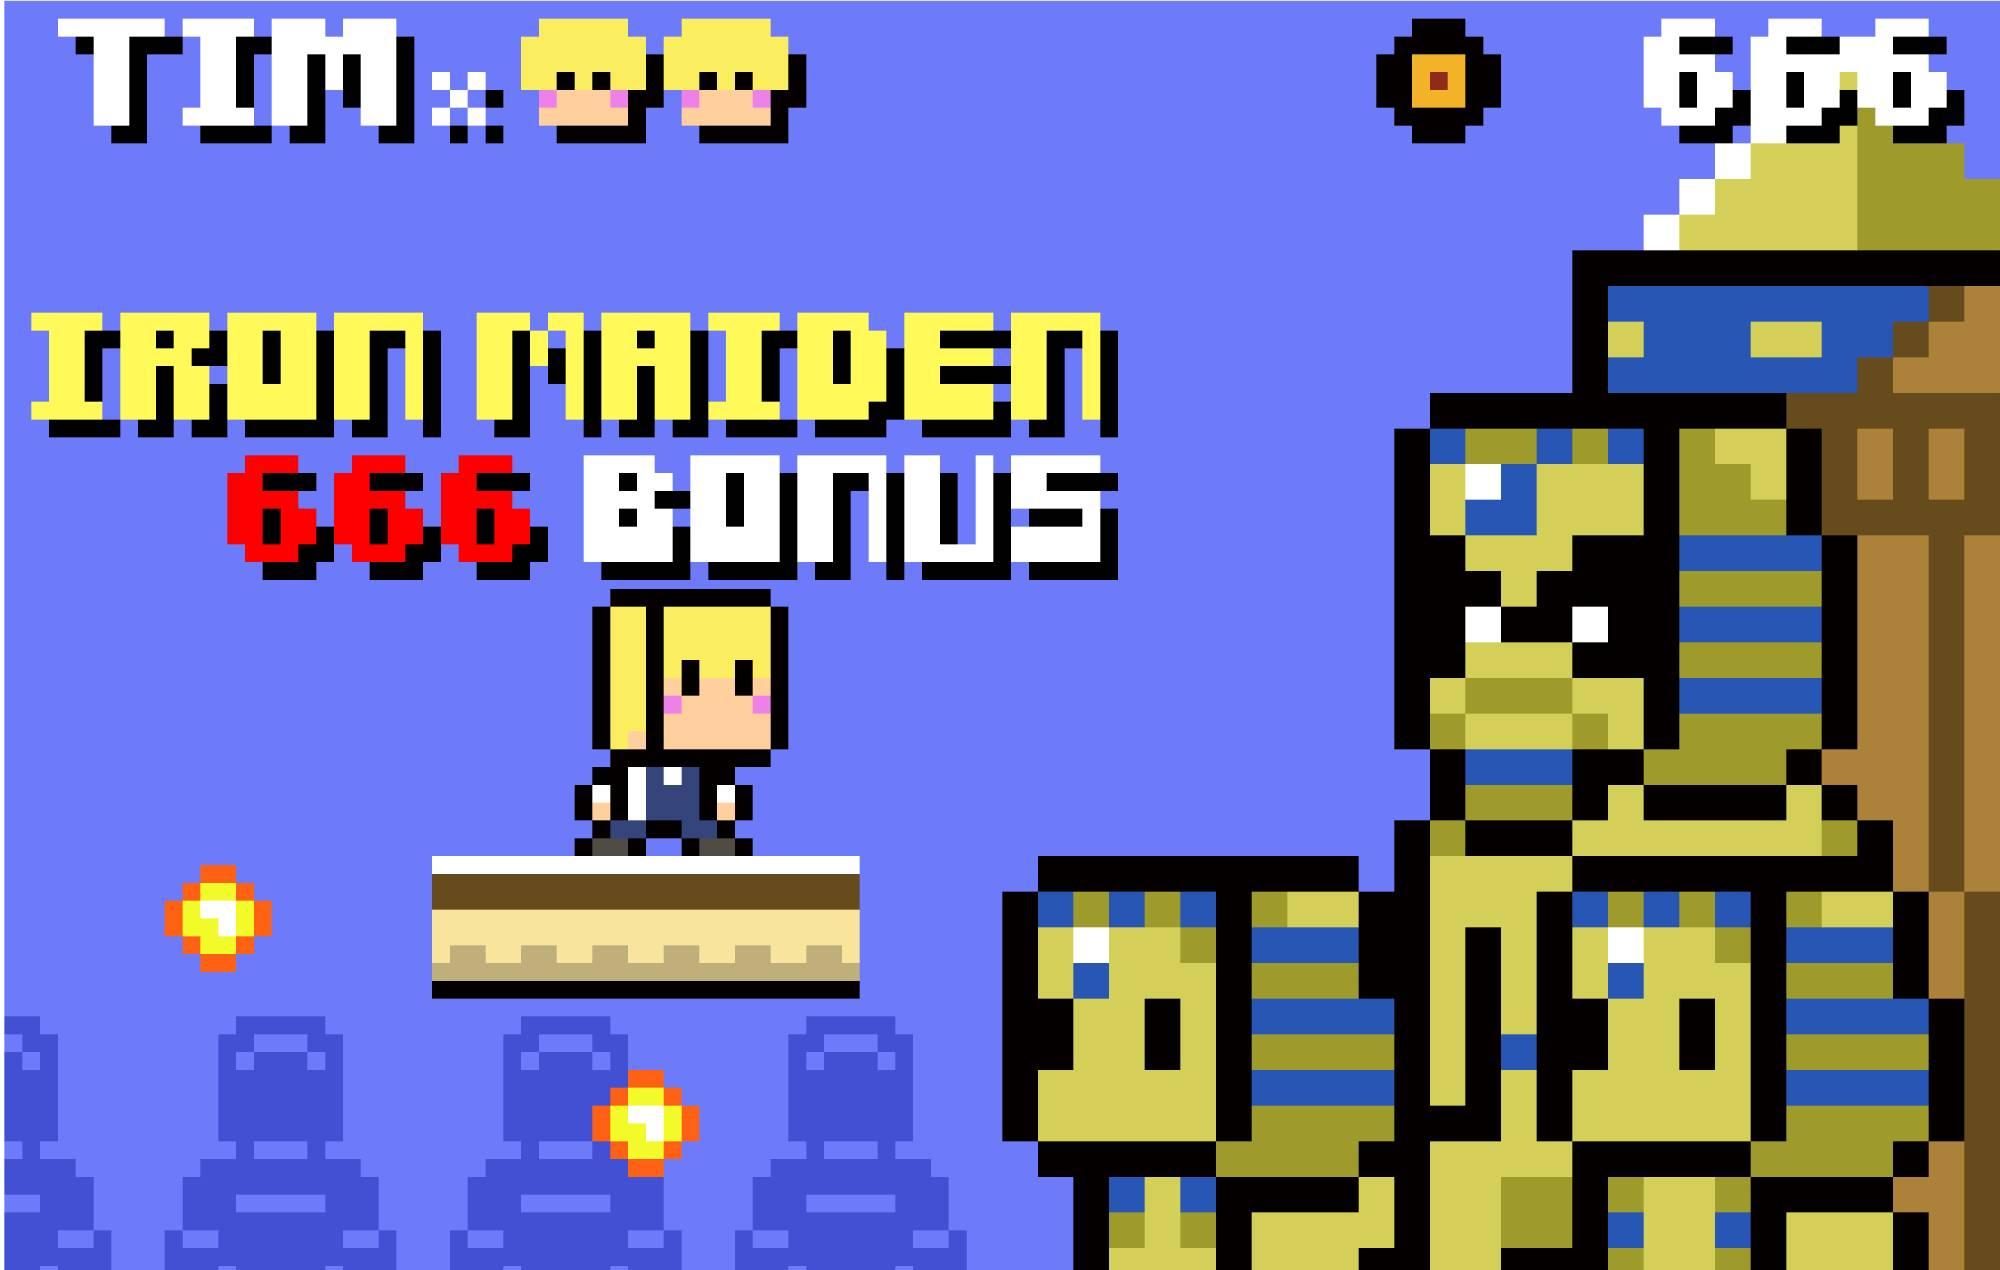 Designer Takekiyo has made a demo of an 8-Bit video game for The Charlatans' frontman Tim Burgess' #TimsTwitterListeningParty series. Credit: Takekiyo